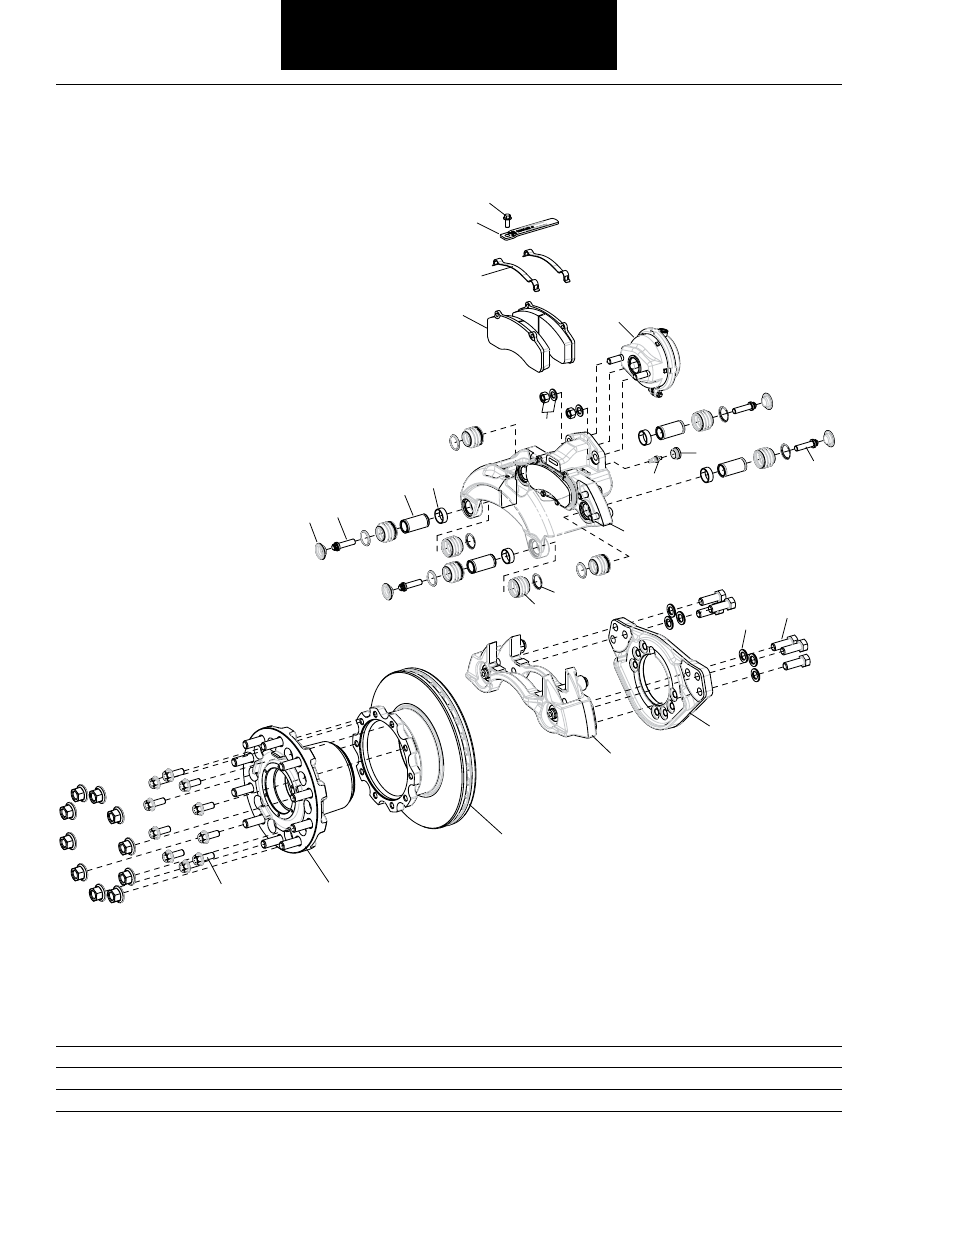 Sequoia Radio Wiring Diagram Wiring Harness Wiring Diagram